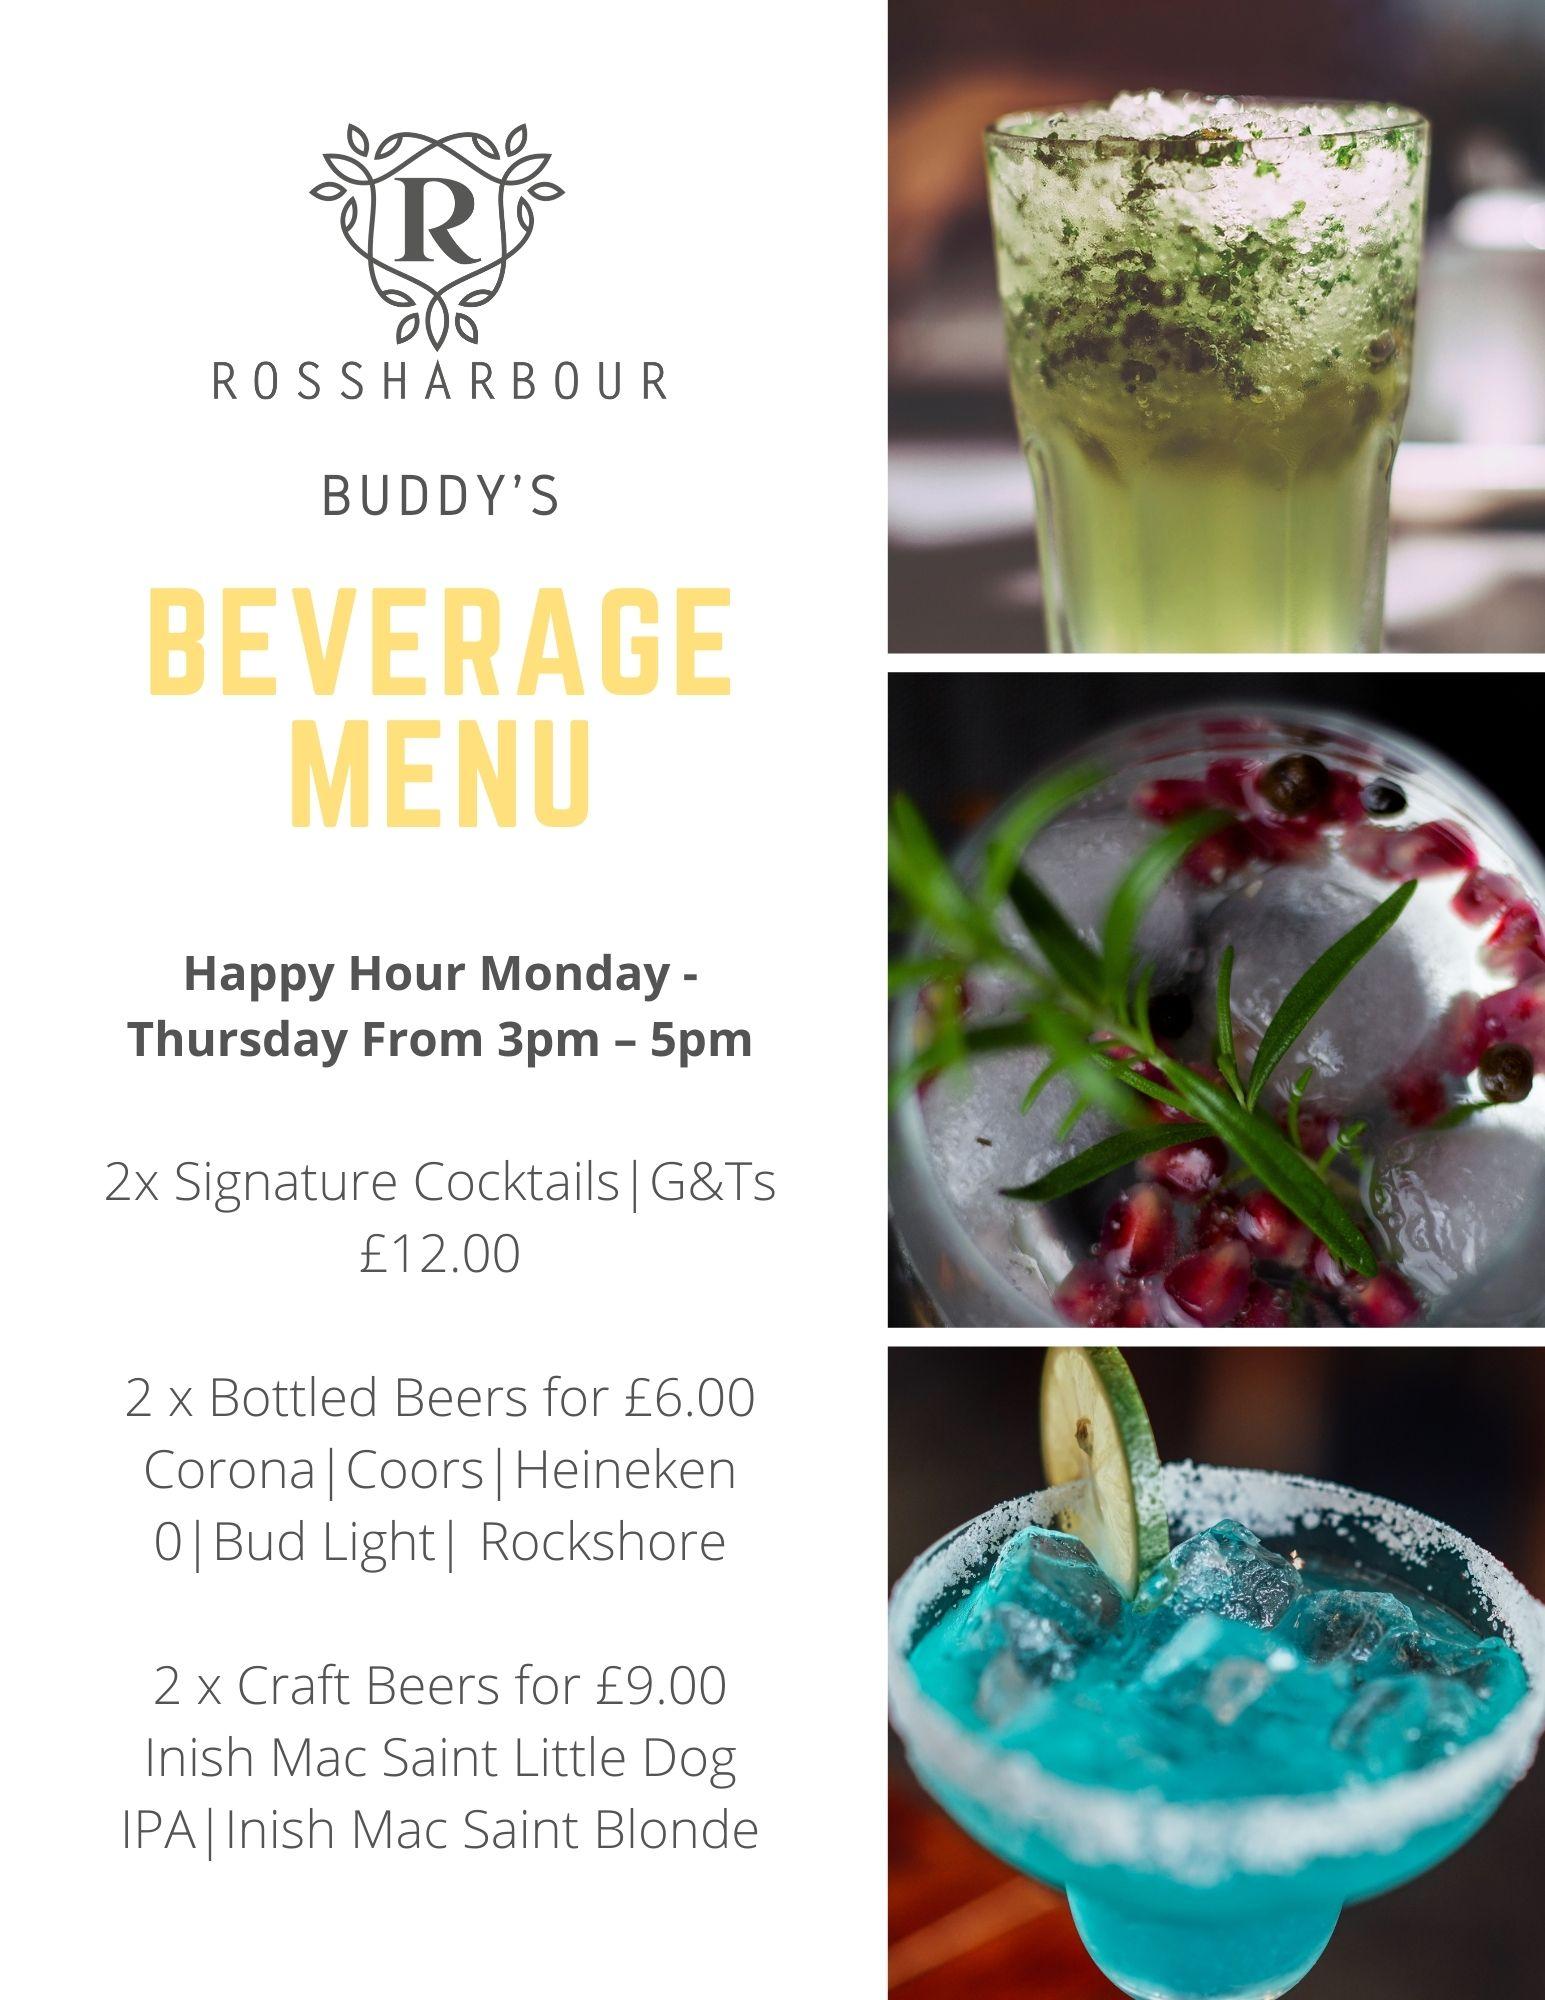 buddys-beverage-menu-28.04.21